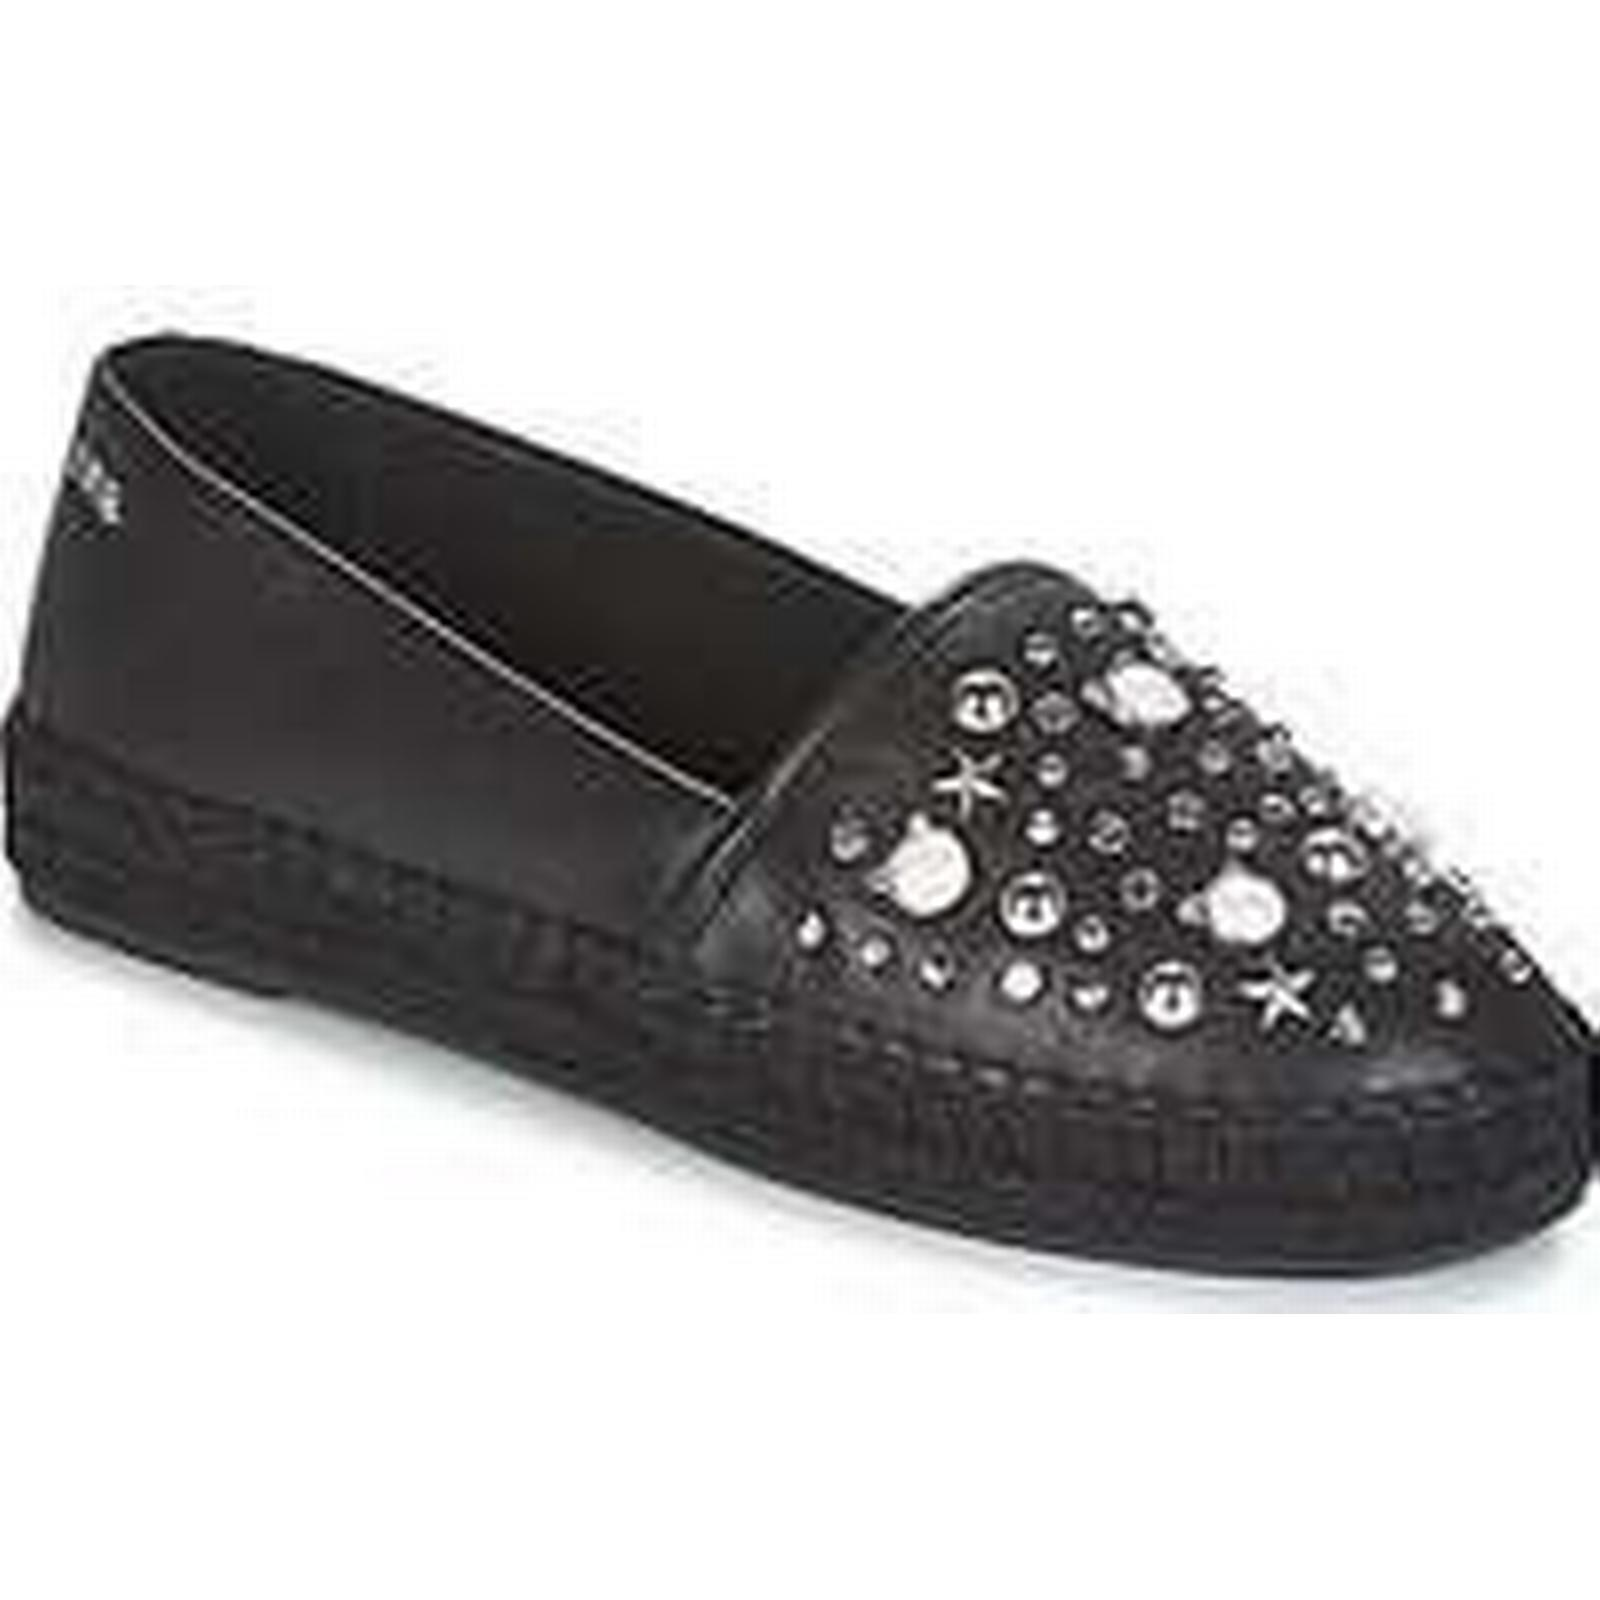 Spartoo.co.uk Karl Lagerfeld KAMINI CELESTIA women's Espadrilles Black / Casual Shoes in Black Espadrilles 135b77